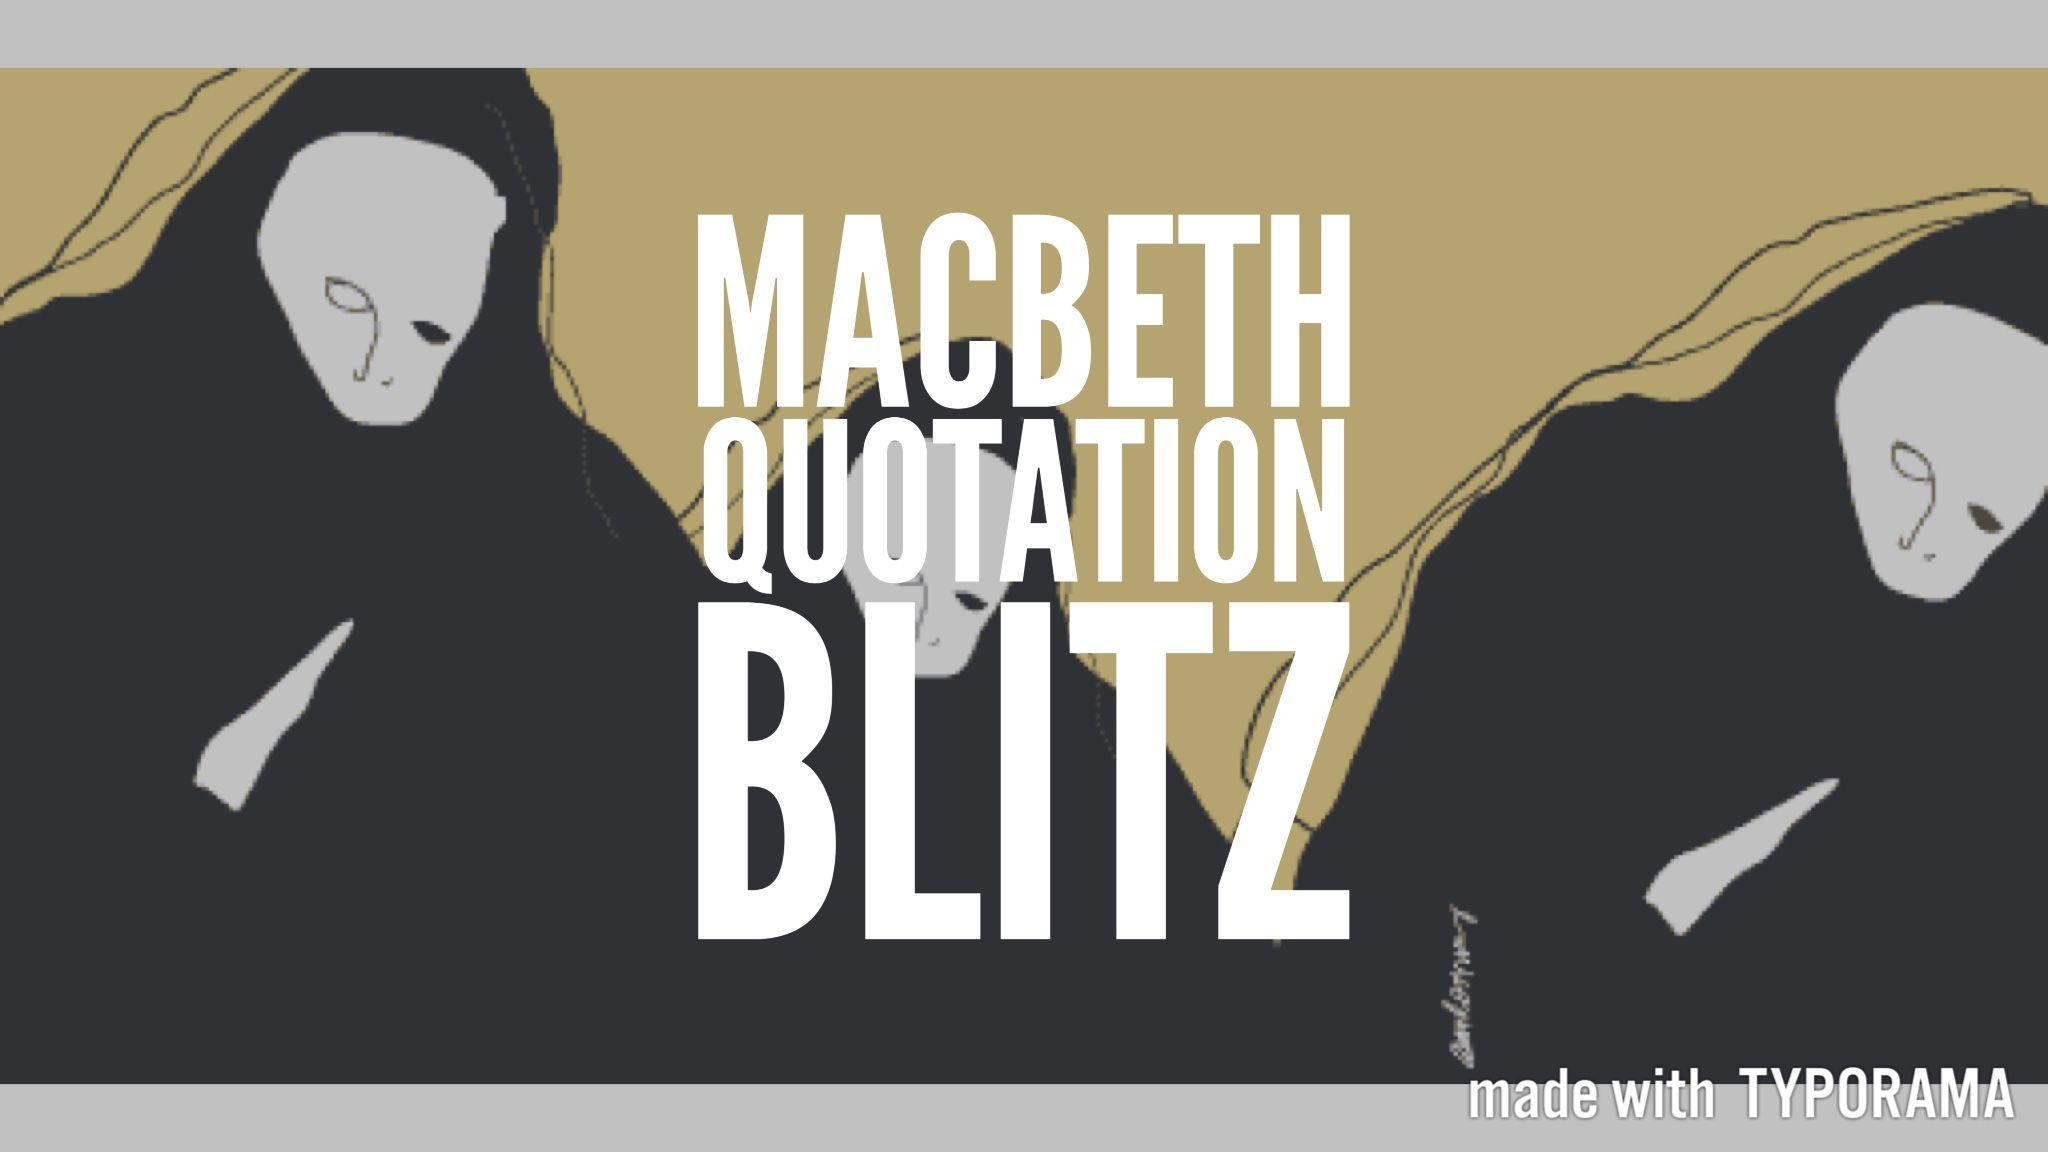 Macbeth Quotation Blitz